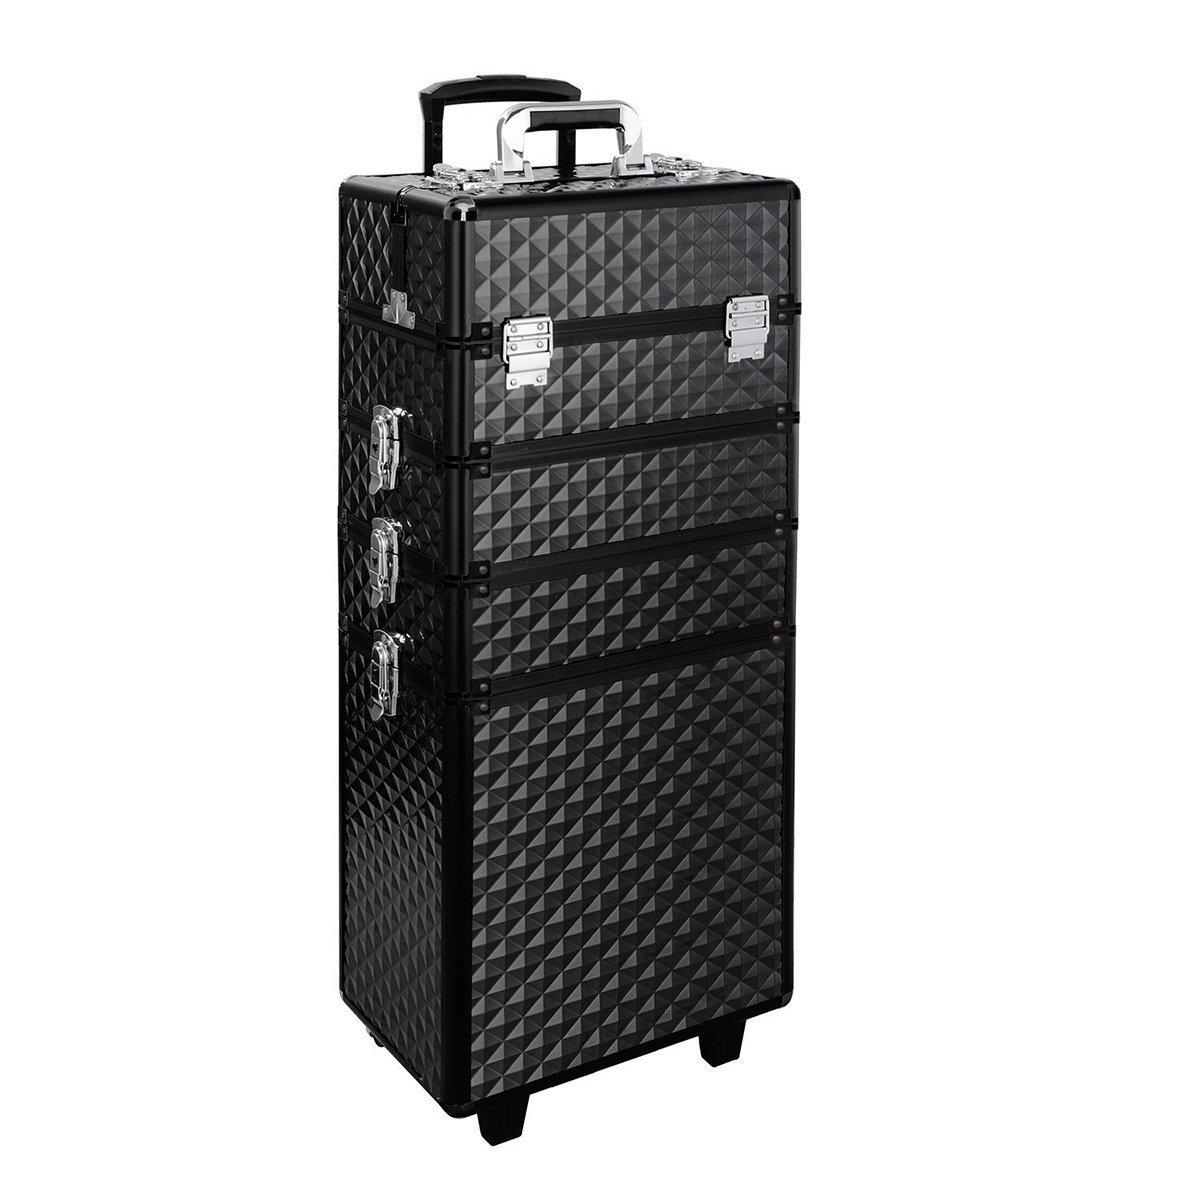 Makeup Trolley Case, WarmieHomy 4 in 1 Aluminum Rolling Makeup Train Case Professional Beautician Artist Travel Makeup Case w/2 Wheels (Diamond Black)